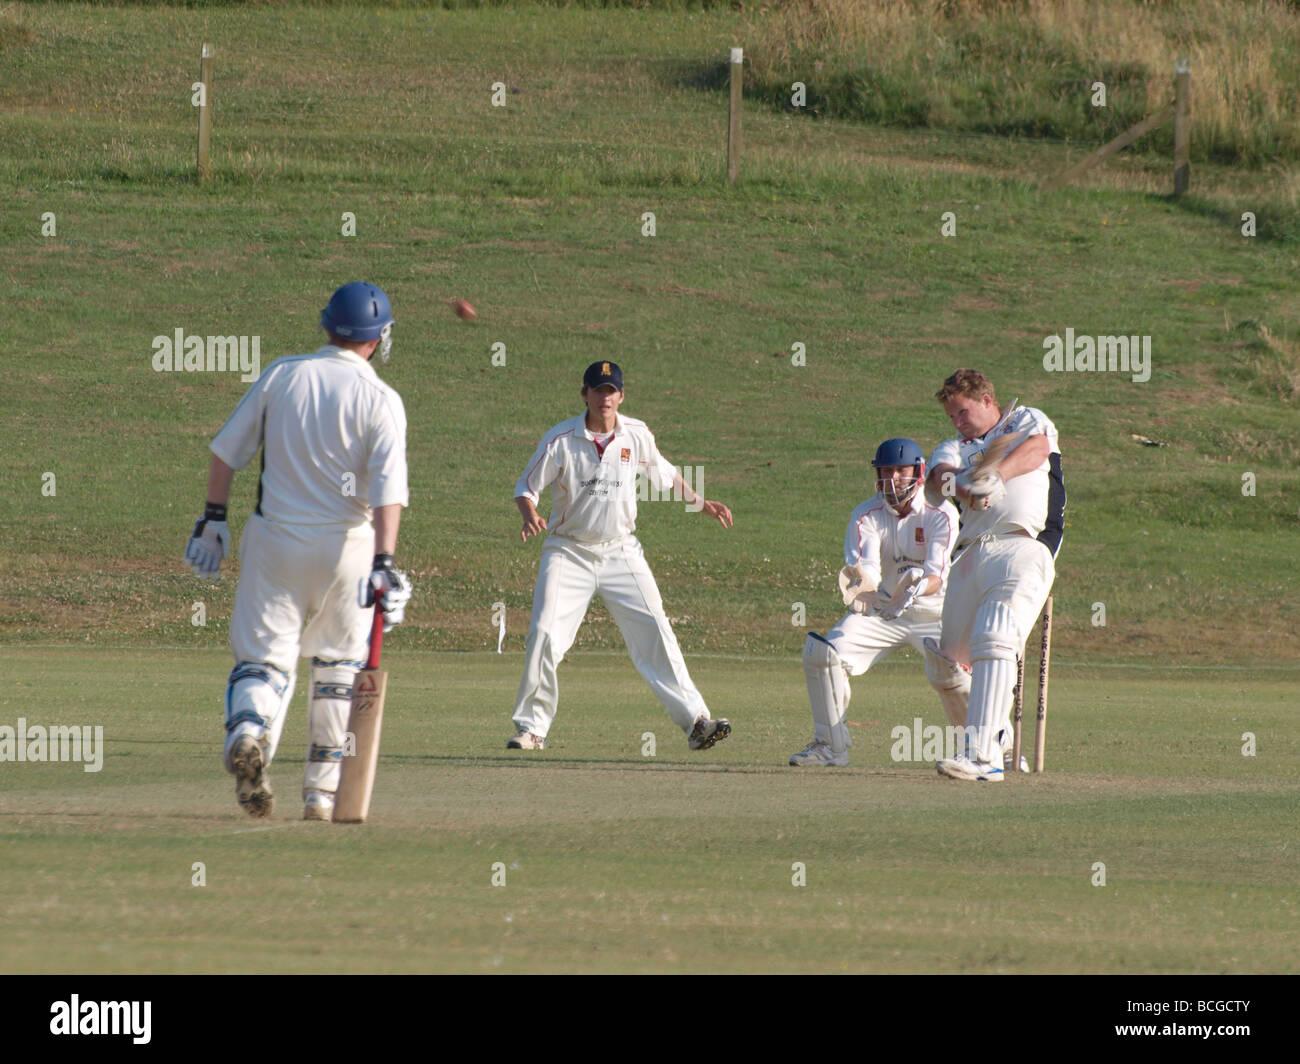 Batsman slogging the ball Amateur cricket match Bude Cornwall - Stock Image